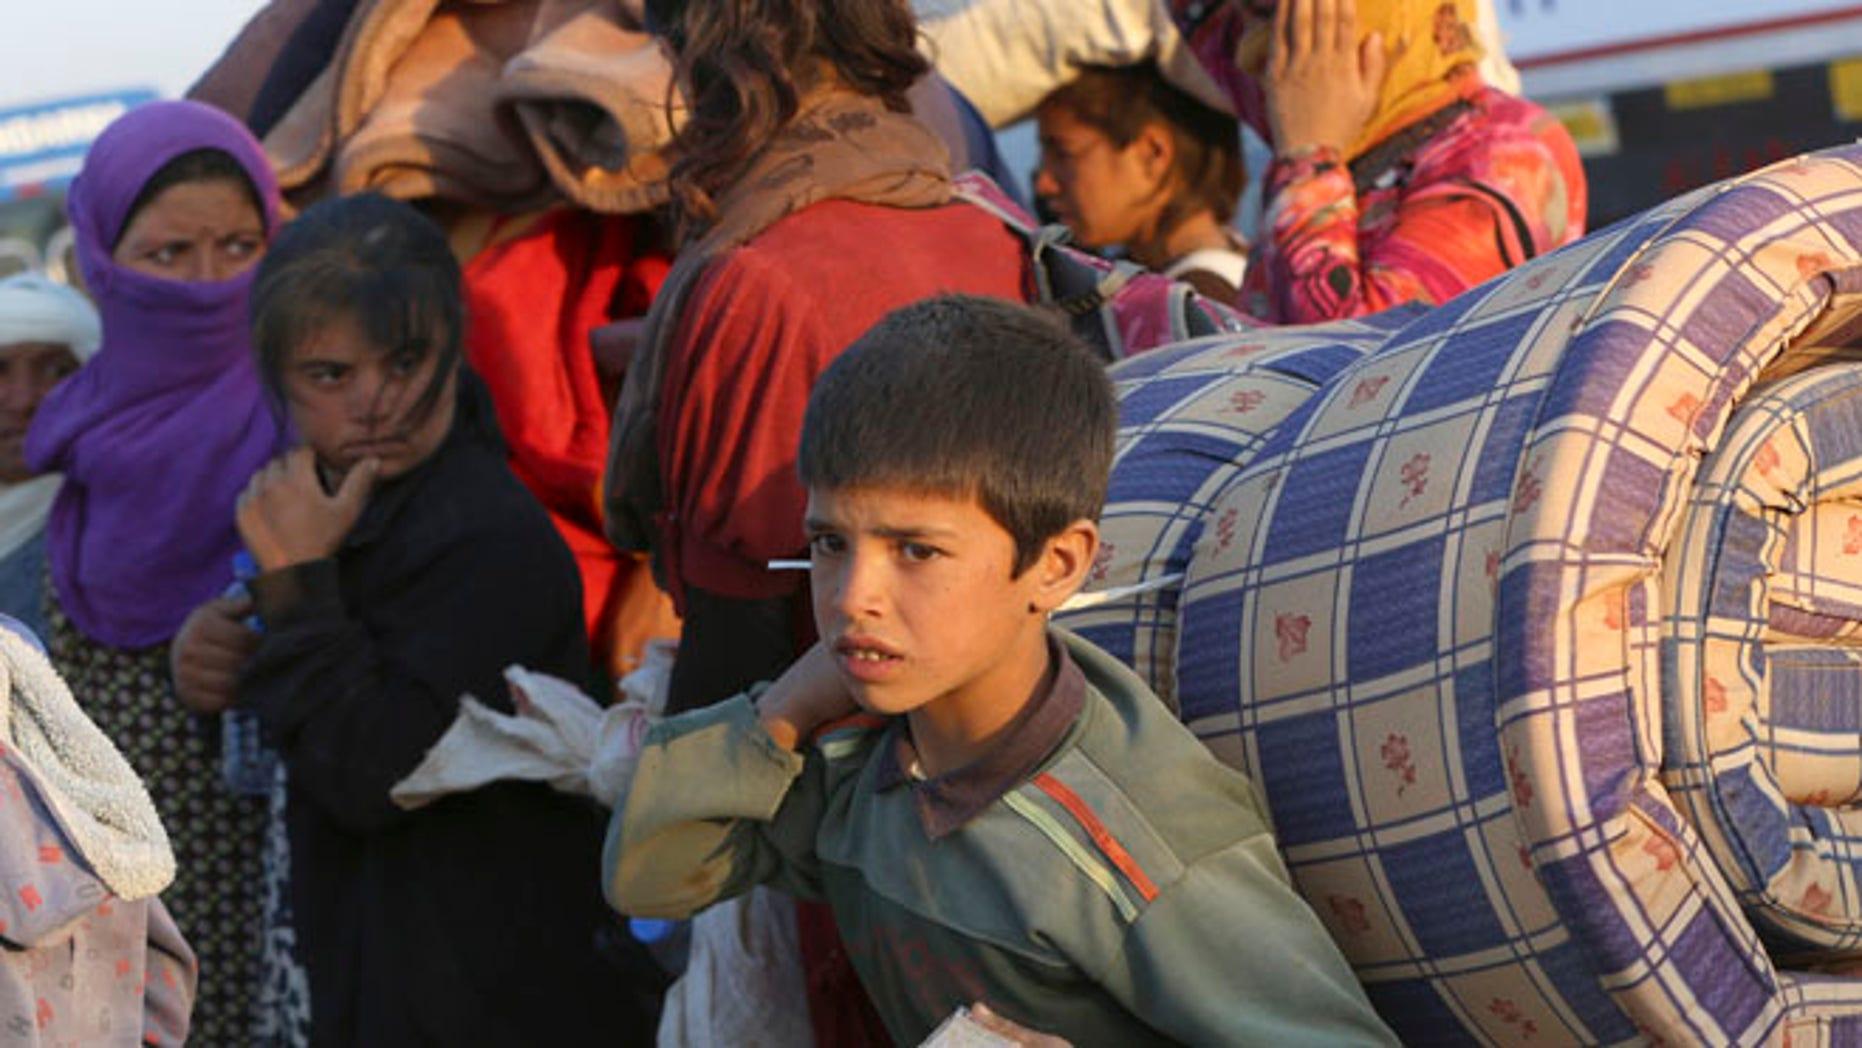 Sept. 23, 2014: Thousands of Syrian refugees enter Turkey at Yumurtalik crossing gate near Suruc